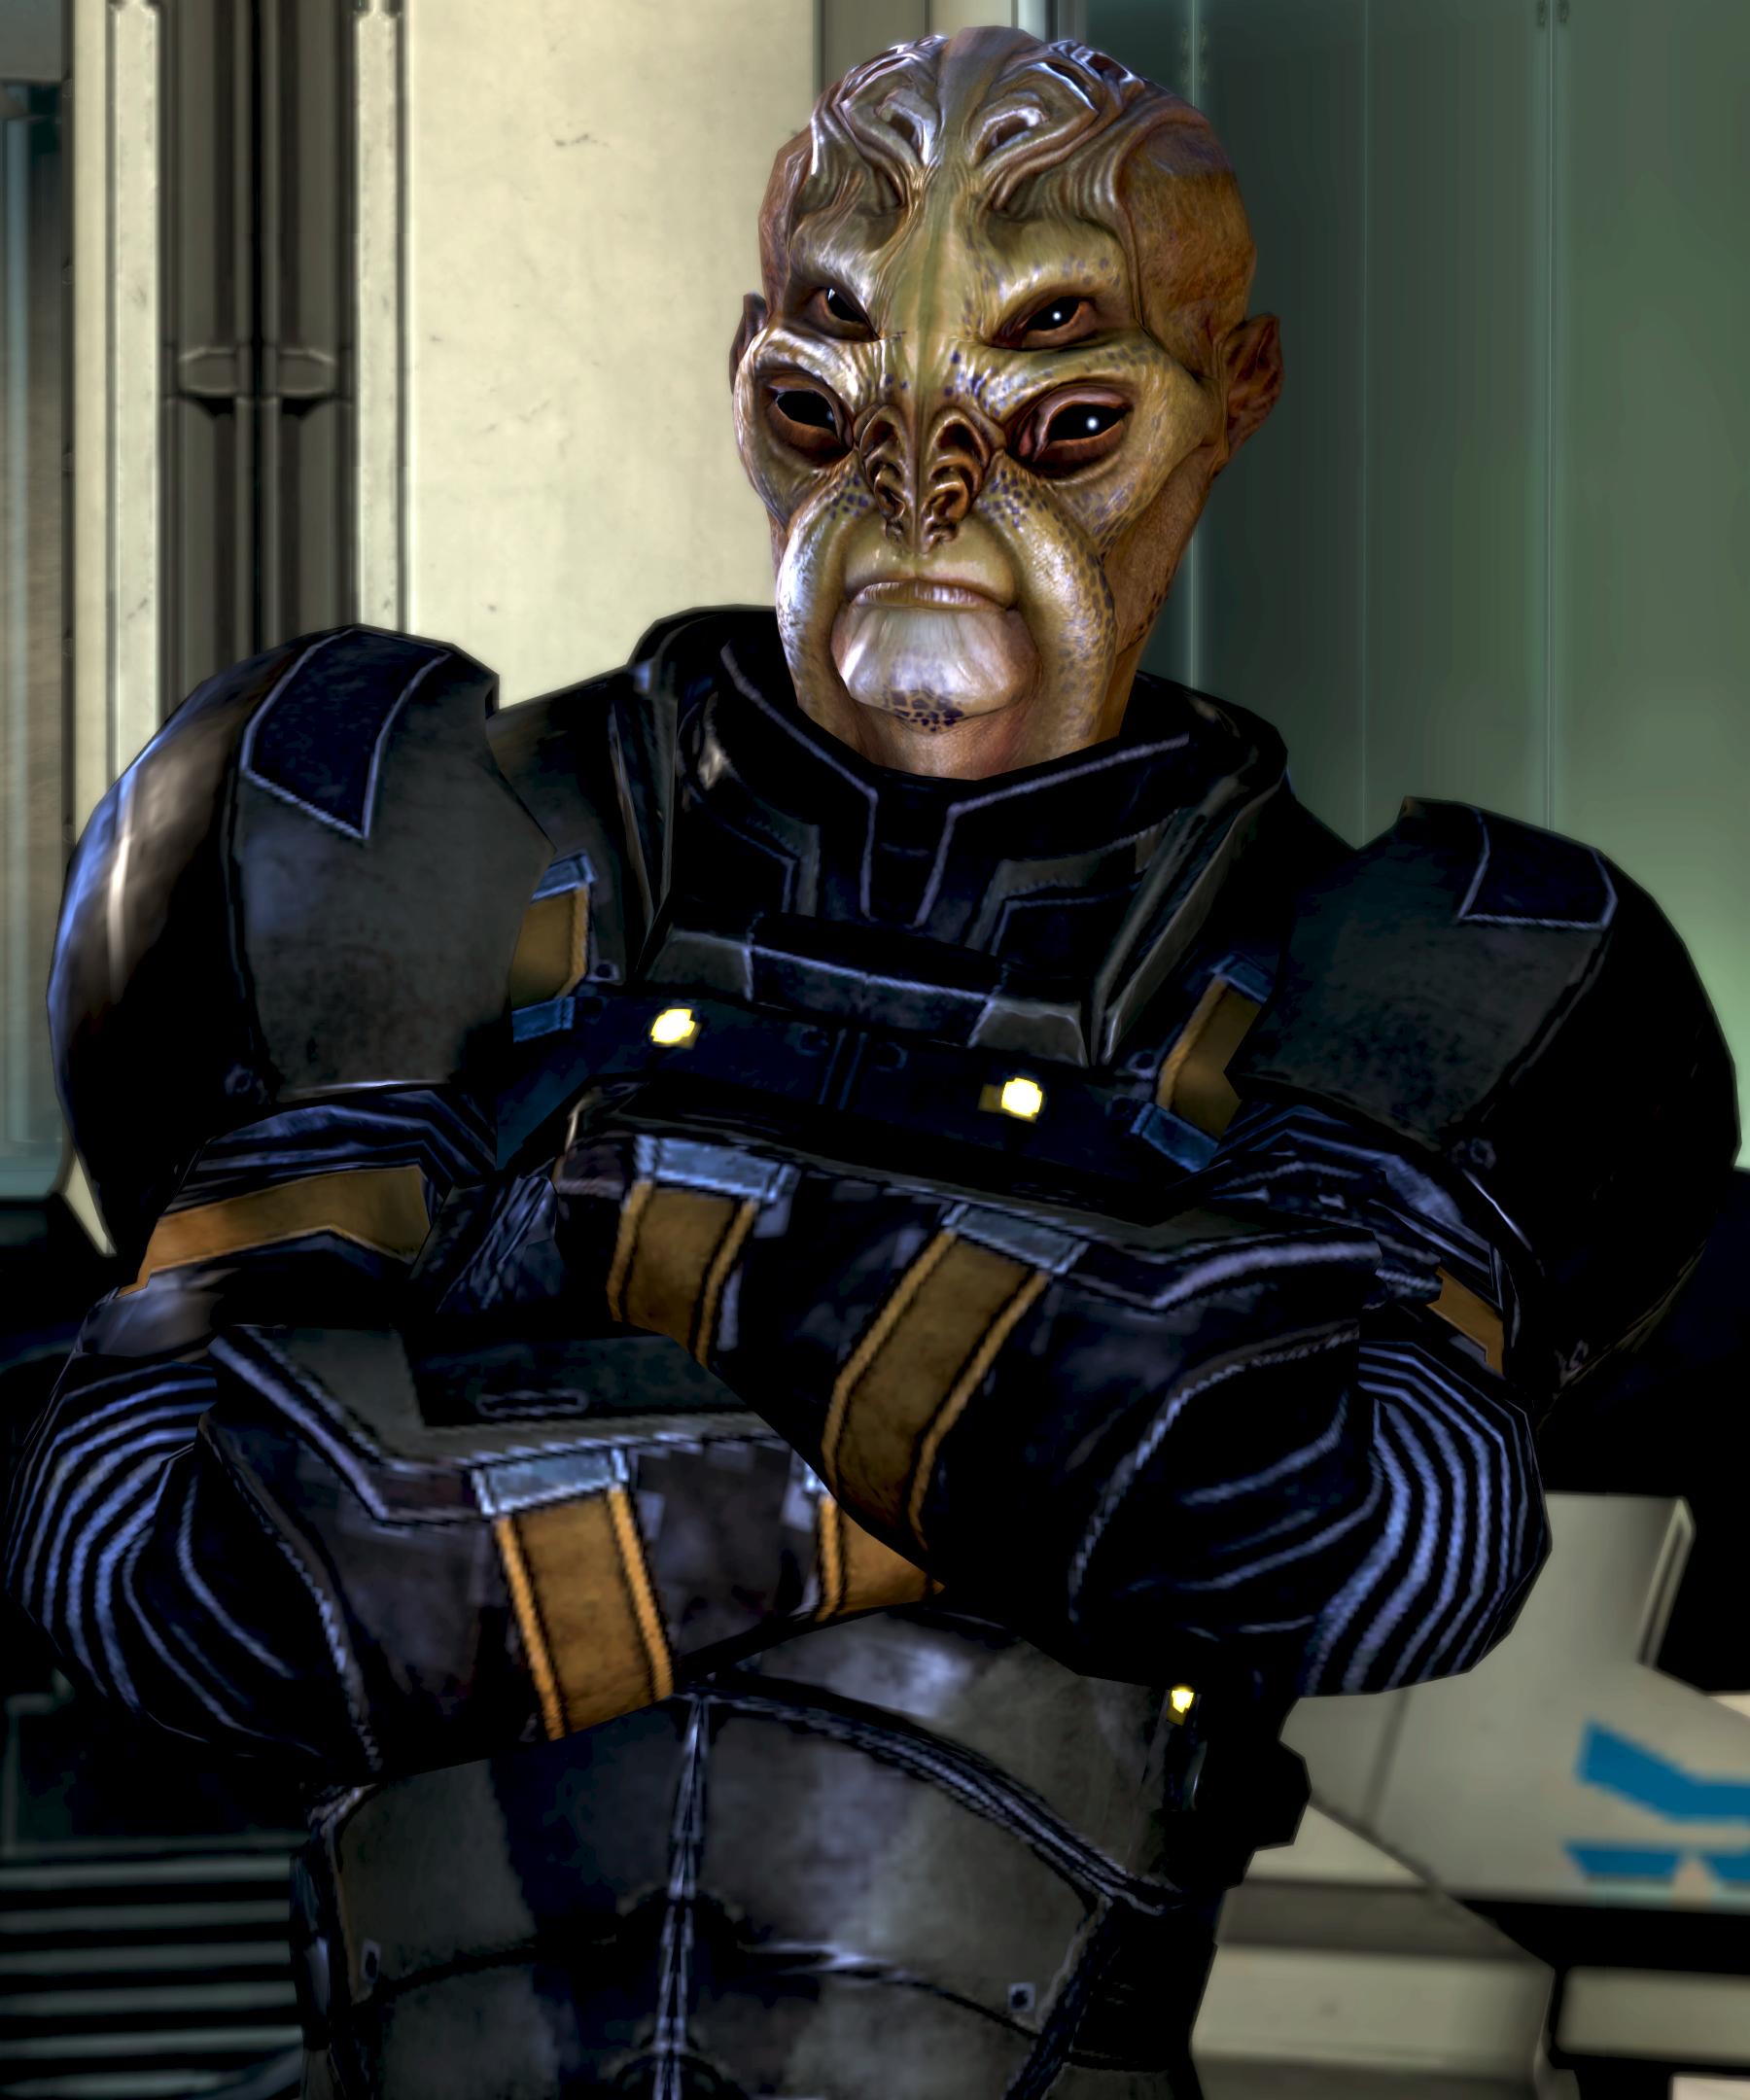 Mass Effect Live Wallpaper: Prose On Batarian-Hegemony